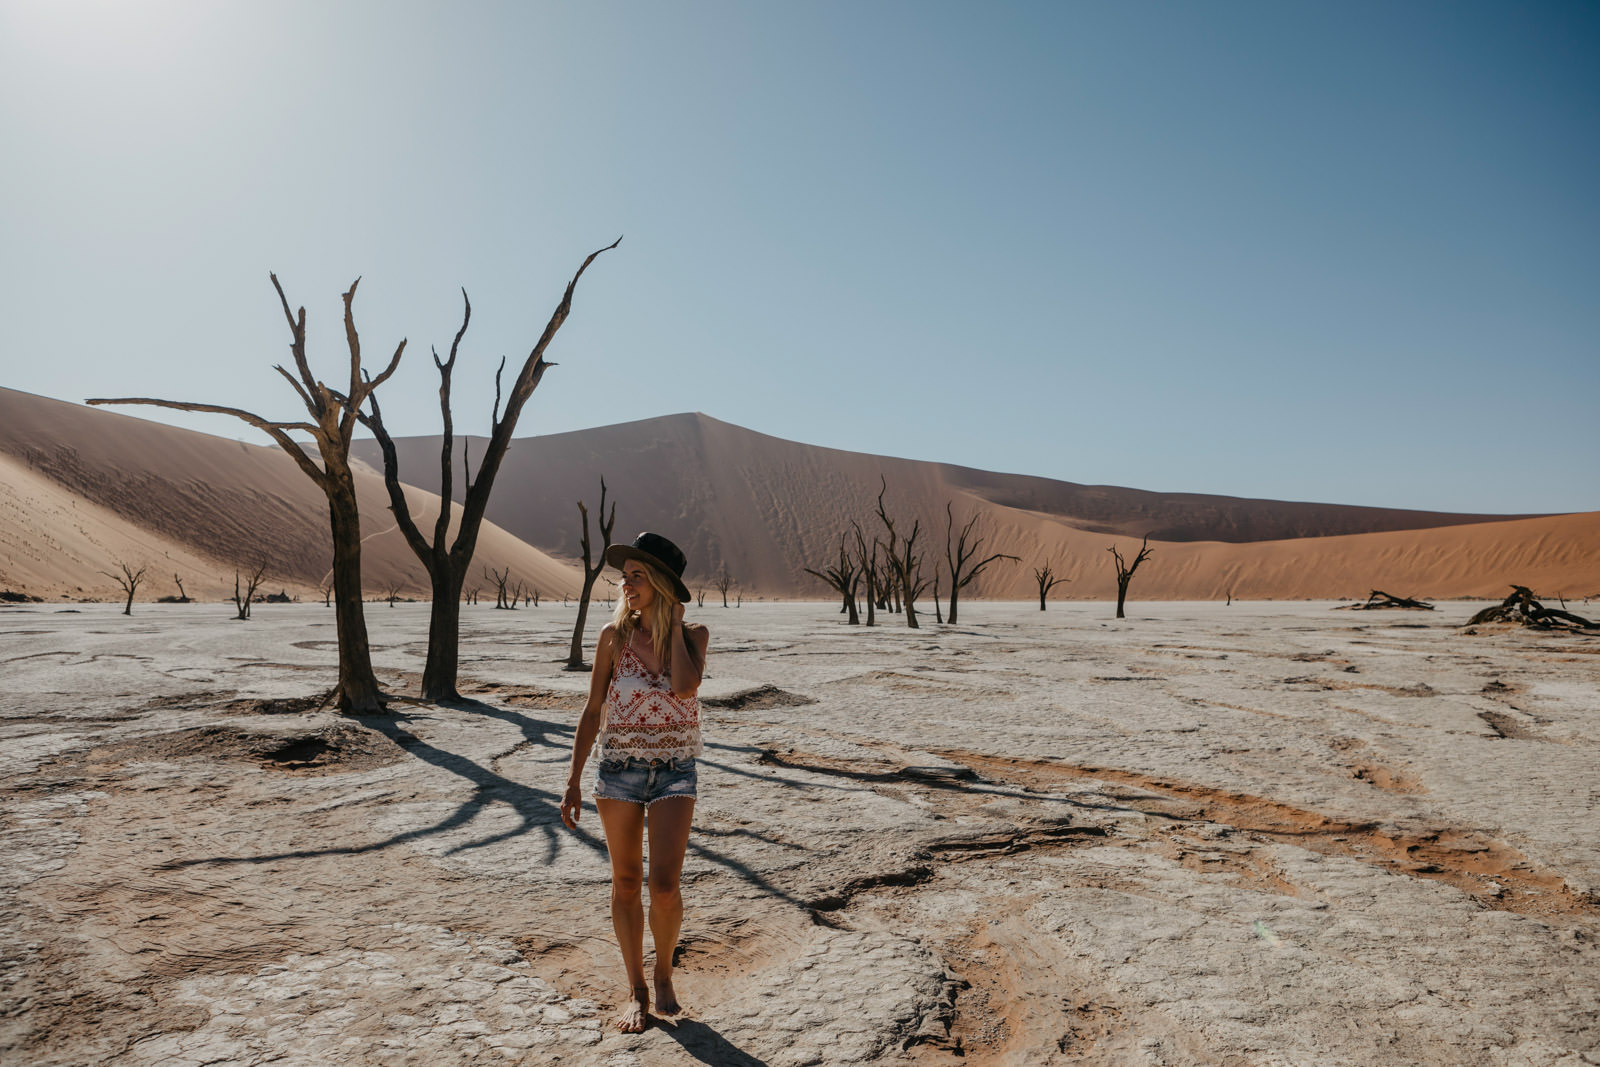 namibia_trip_rooftent_camping_roadtrip (21 von 26).jpg